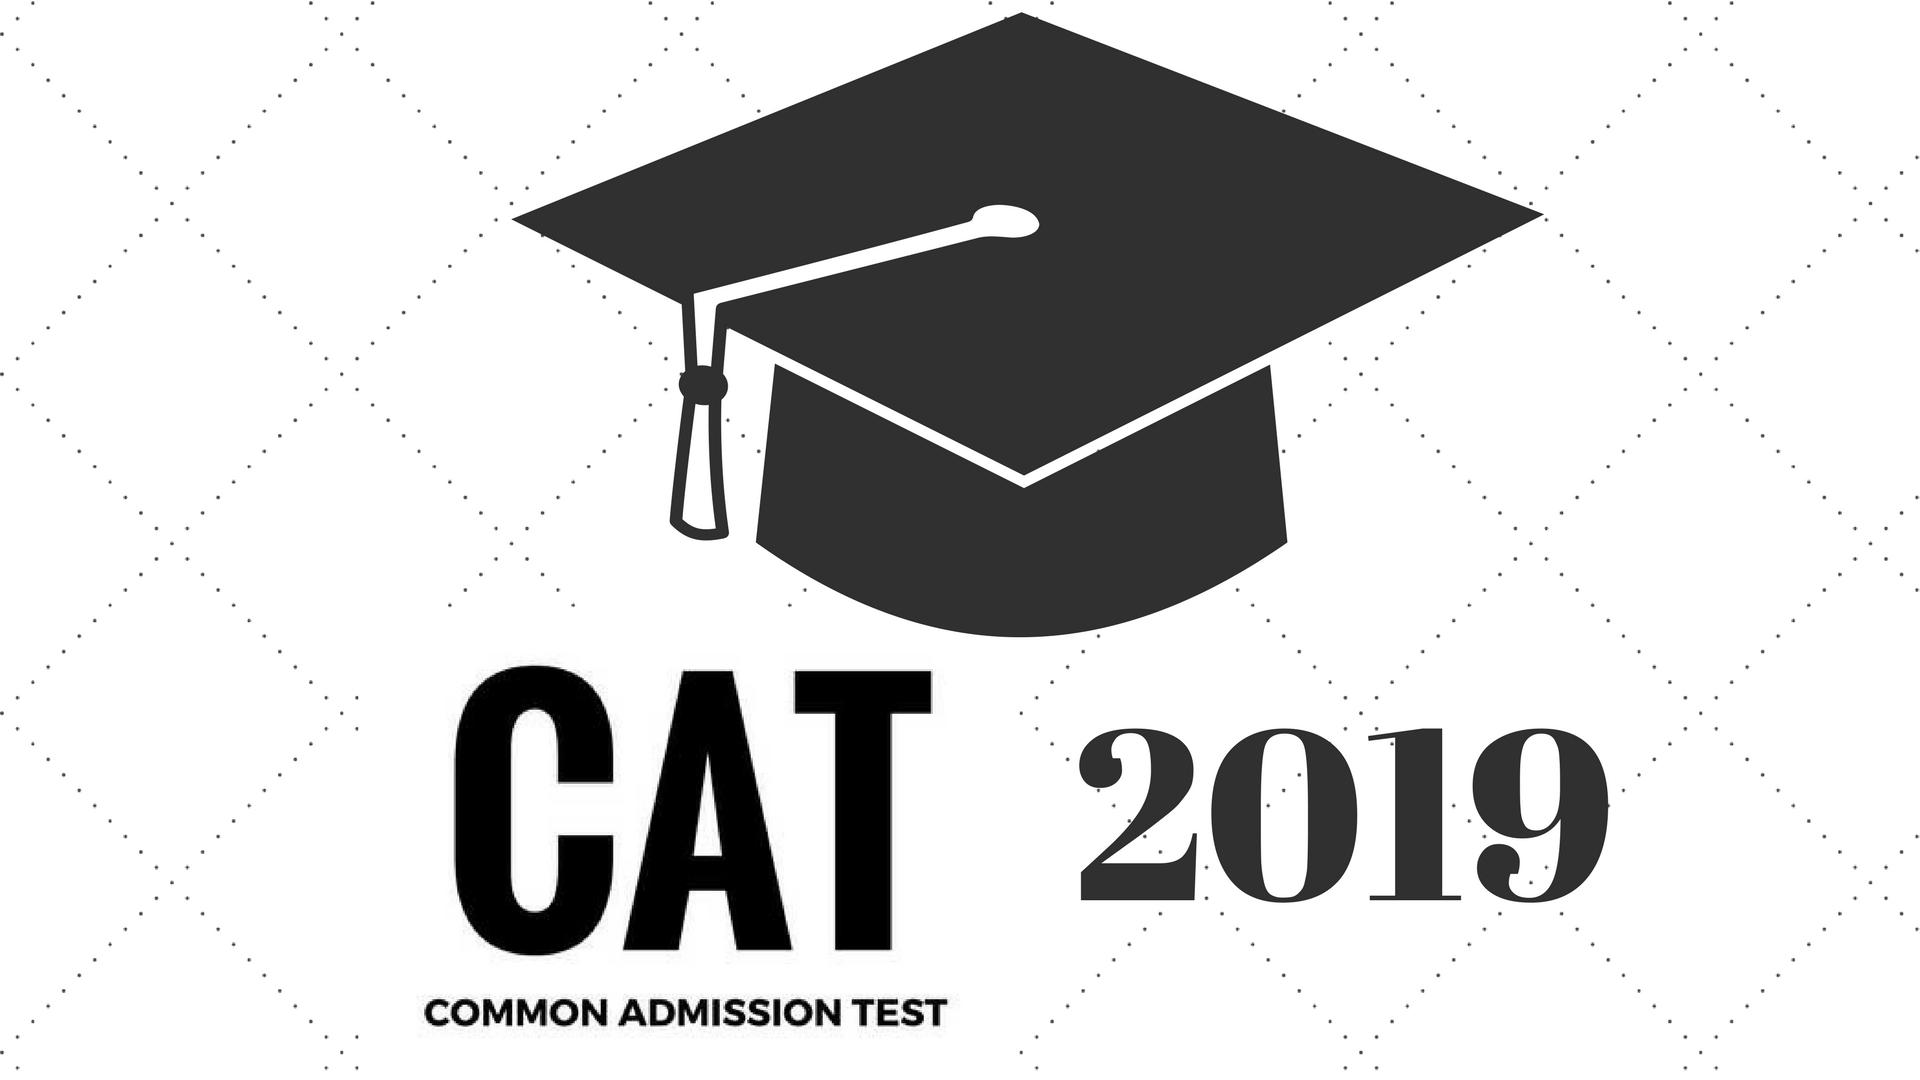 CAT 2019 Exam | Eligibility, Registration Fees, Exam Pattern, Syllabus